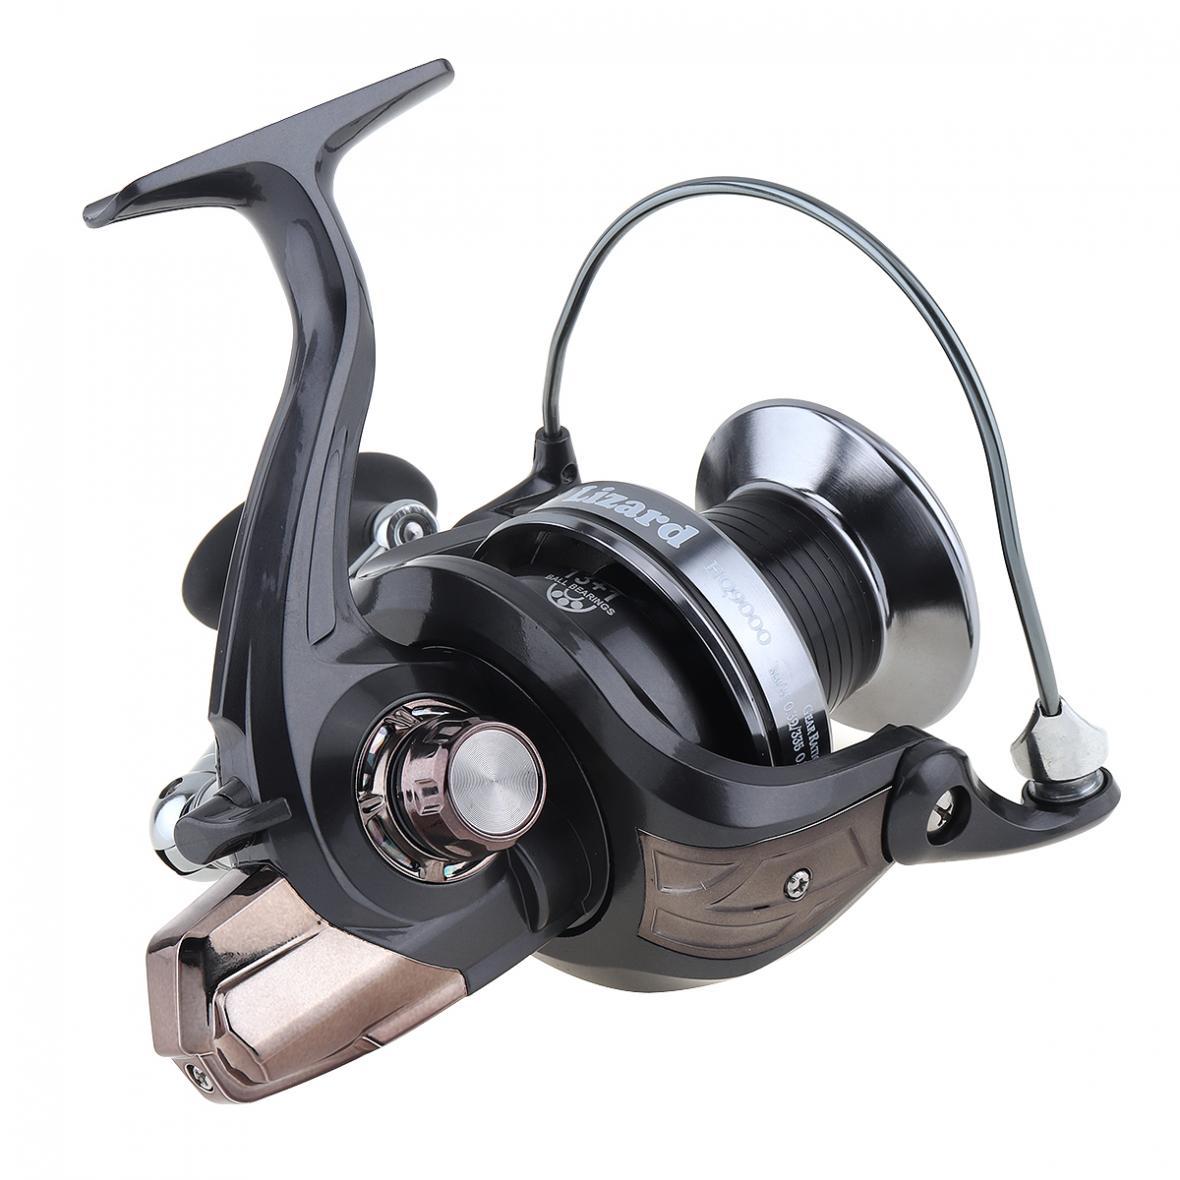 13+1 Ball Bearings 5.11 Spinning Fishing Reel Metal Spool 25KG Max Drag Jigging Trolling Long Shot Left / Right Interchangeable